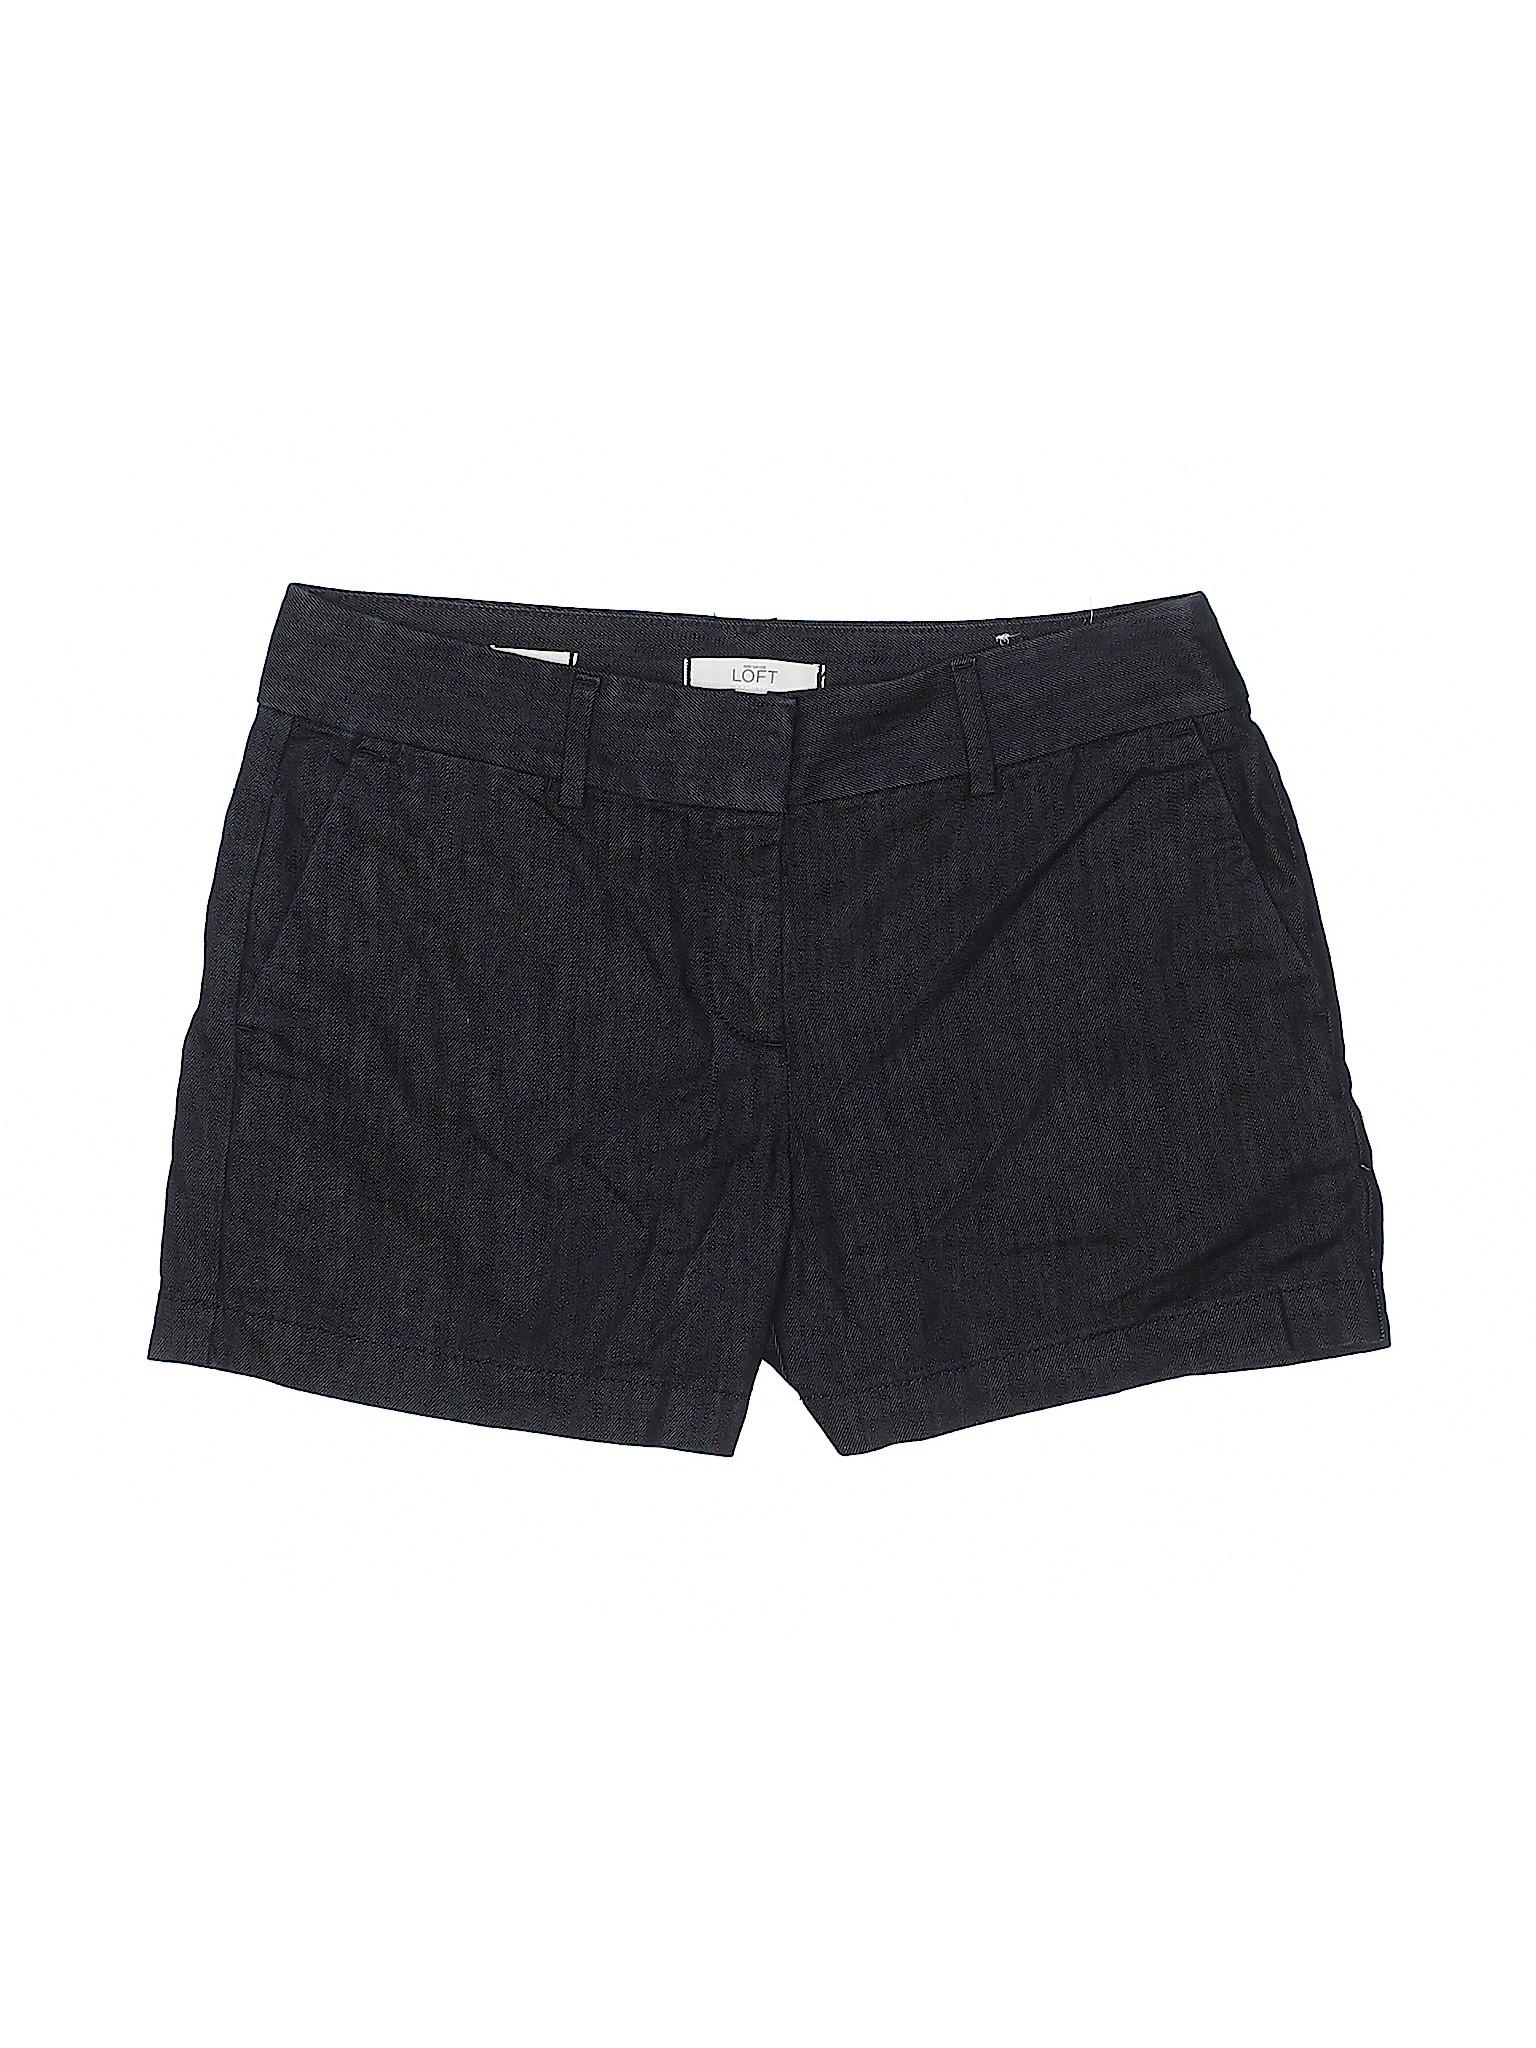 Leisure Denim Ann winter Shorts Taylor LOFT rnrT7q8